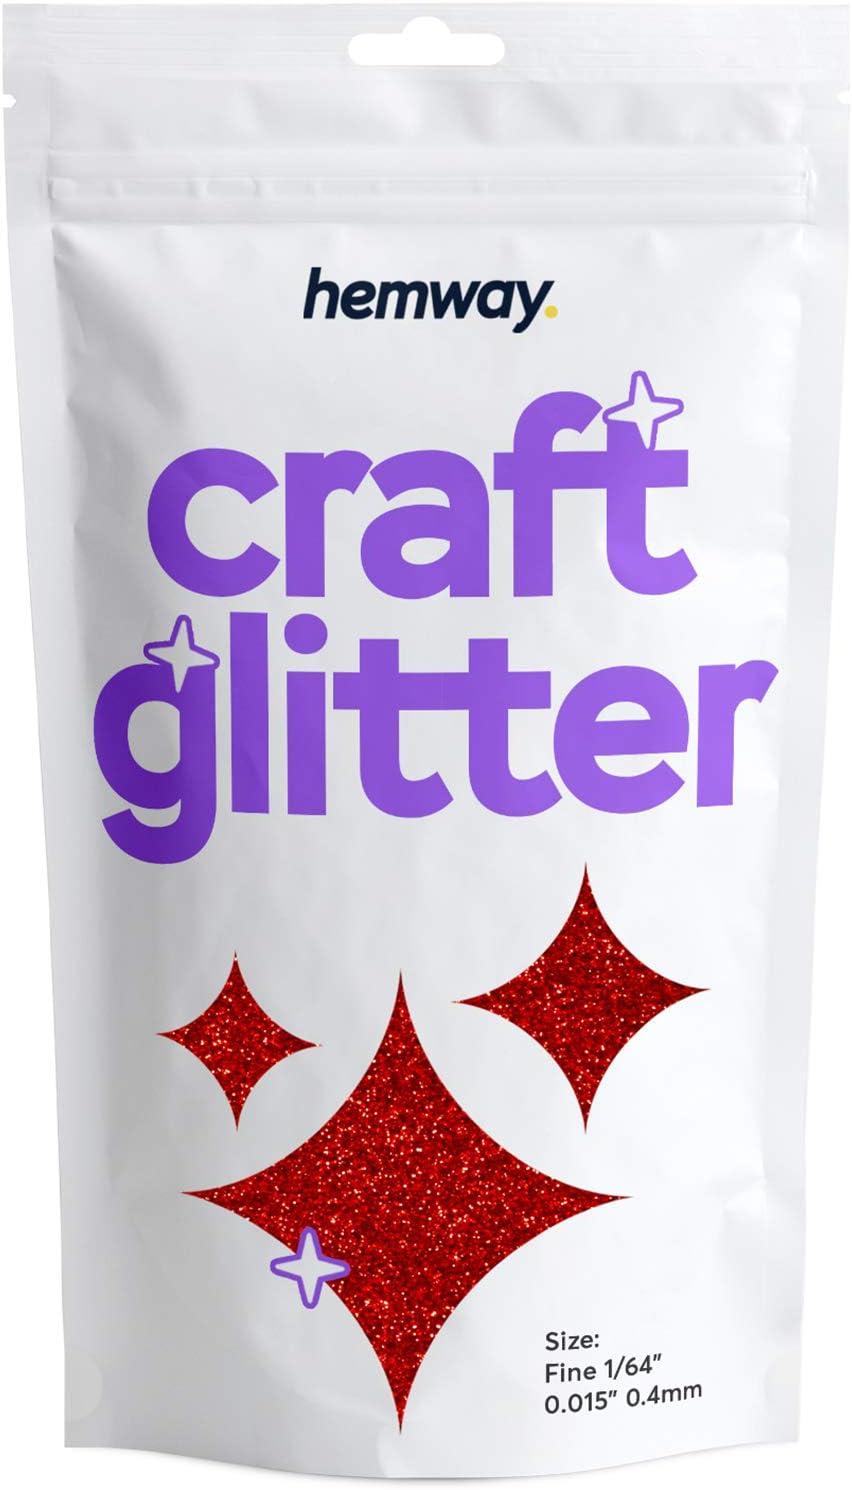 Hemway Direct store Max 55% OFF Red Craft Glitter 100g 3.5oz 1 0.015